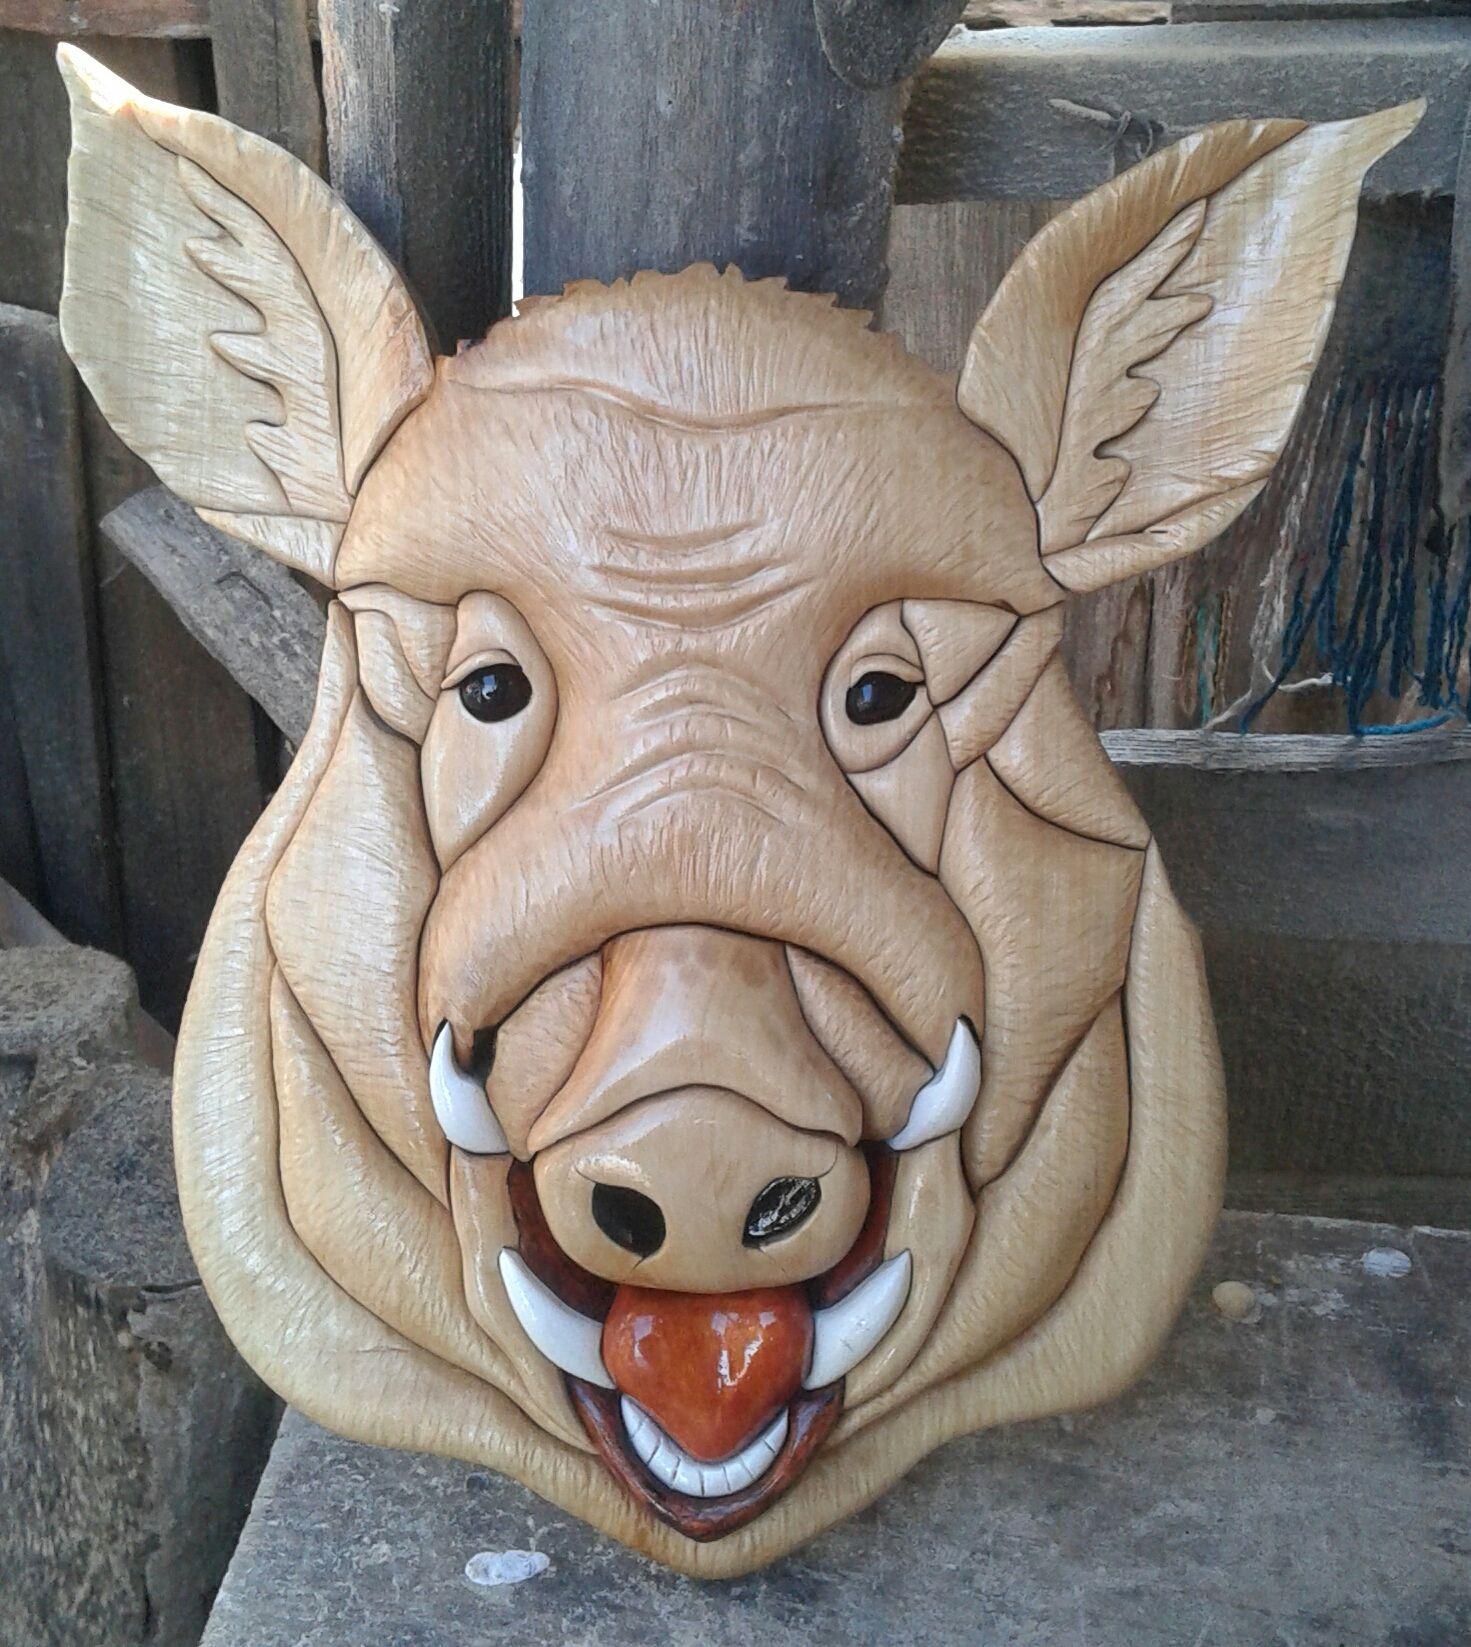 Pin by gwyn kelsall on intarsia pinterest intarsia woodworking